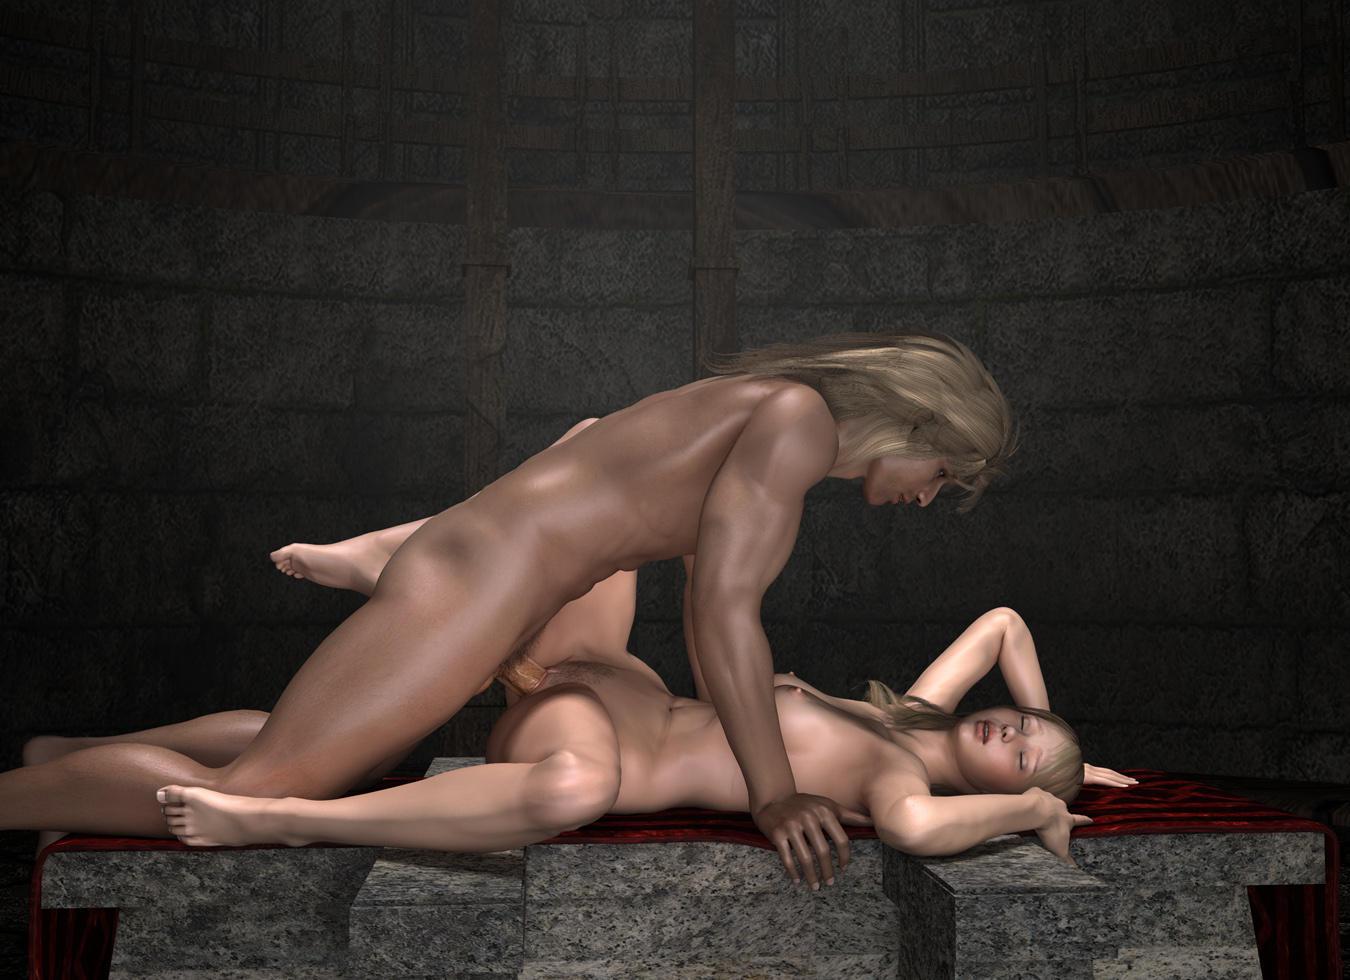 Секс фантазии эротический рассказ, Эротические рассказы Фантазии 16 фотография